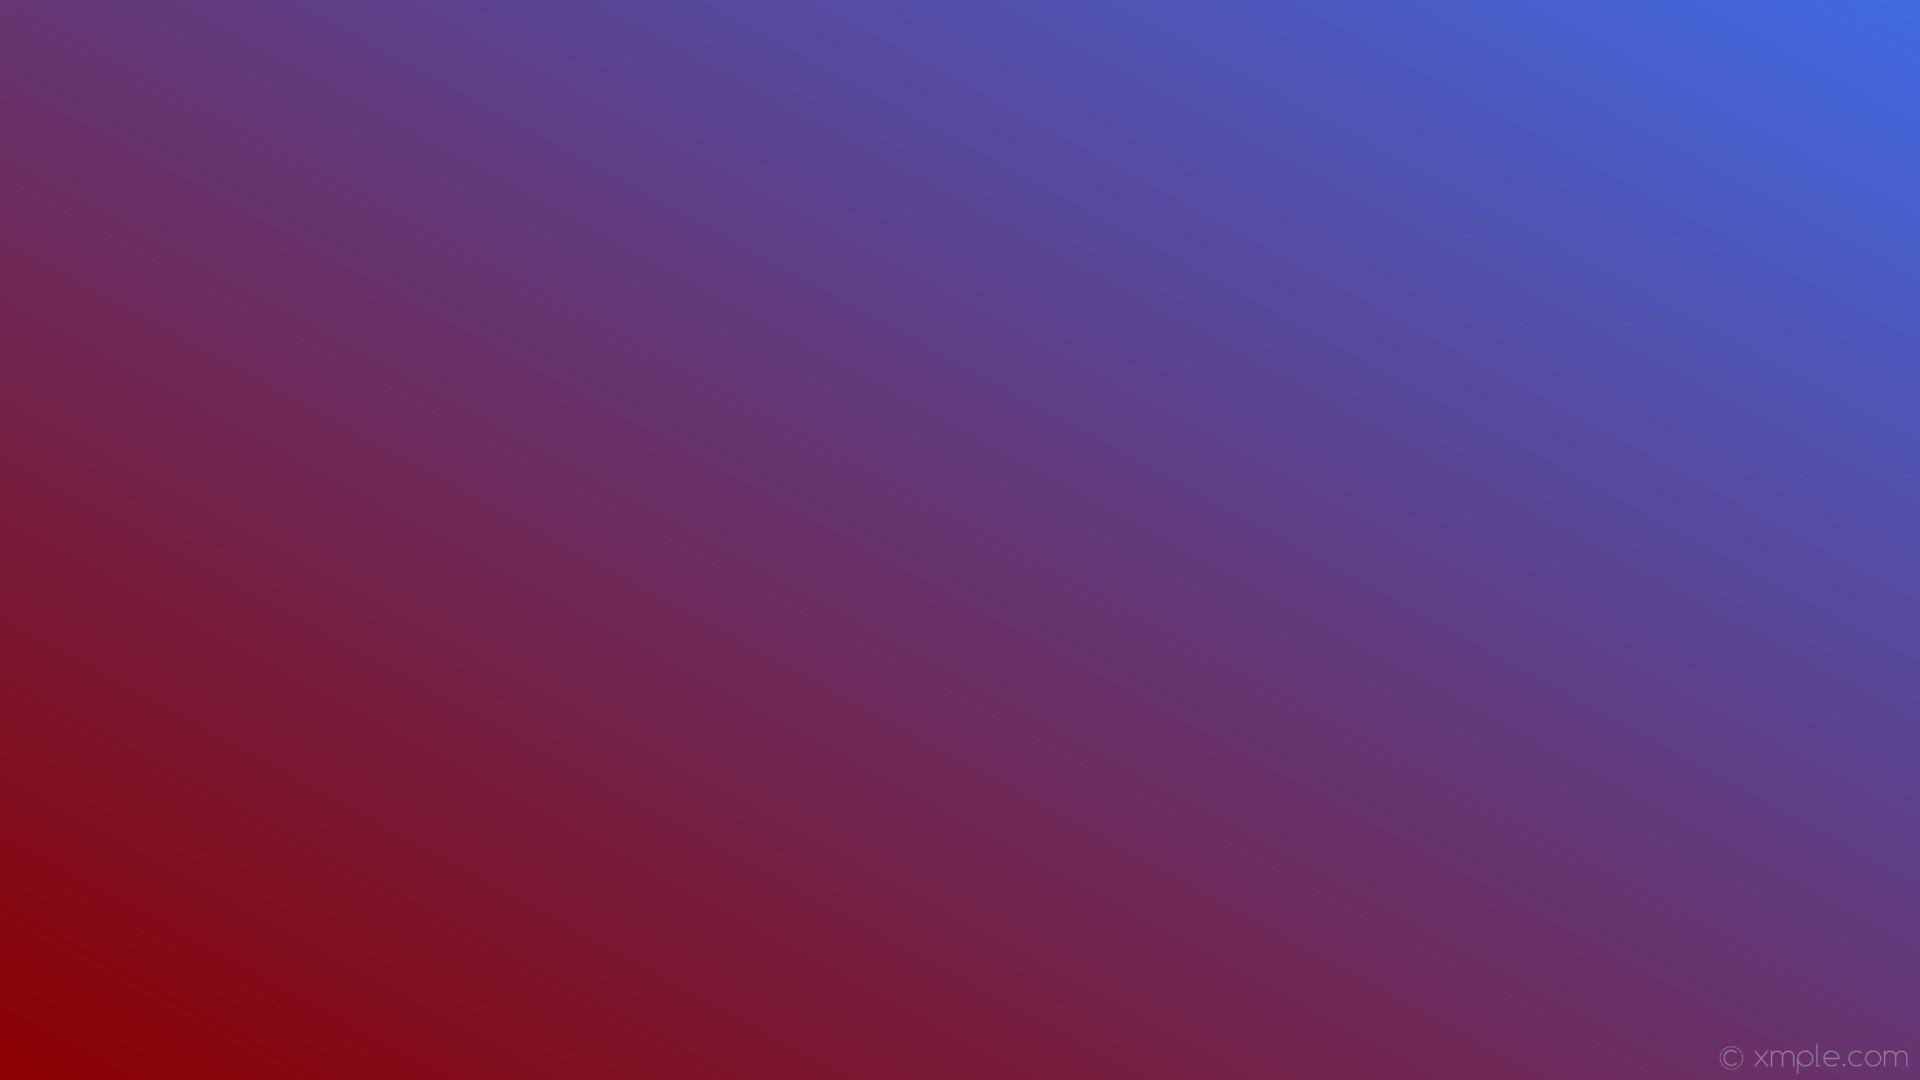 wallpaper gradient linear red blue dark red royal blue #8b0000 #4169e1 210°